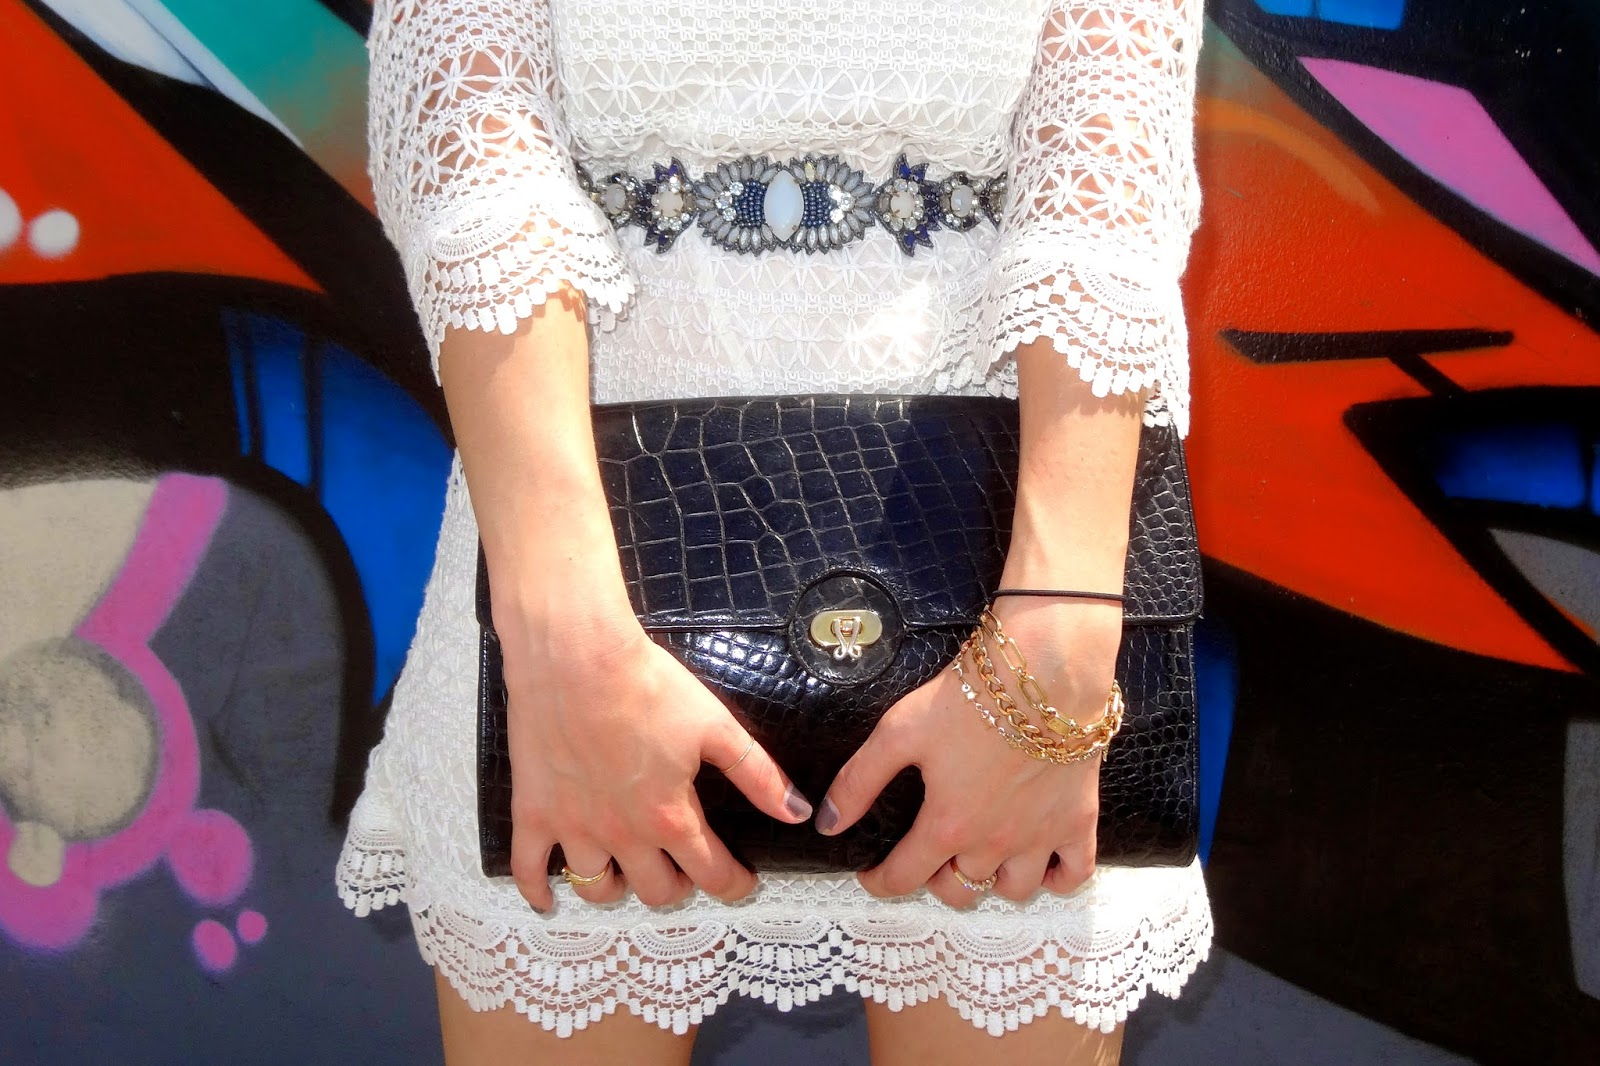 H&M, Ray-Ban, Anthropologie, BCBG Paris, DSW, vintage, LWD, little white dress, Miami fashion, Miami fashion blogger, fashion blog, style blog, street style, Summer Fashion Bash, Wynwood, Miami